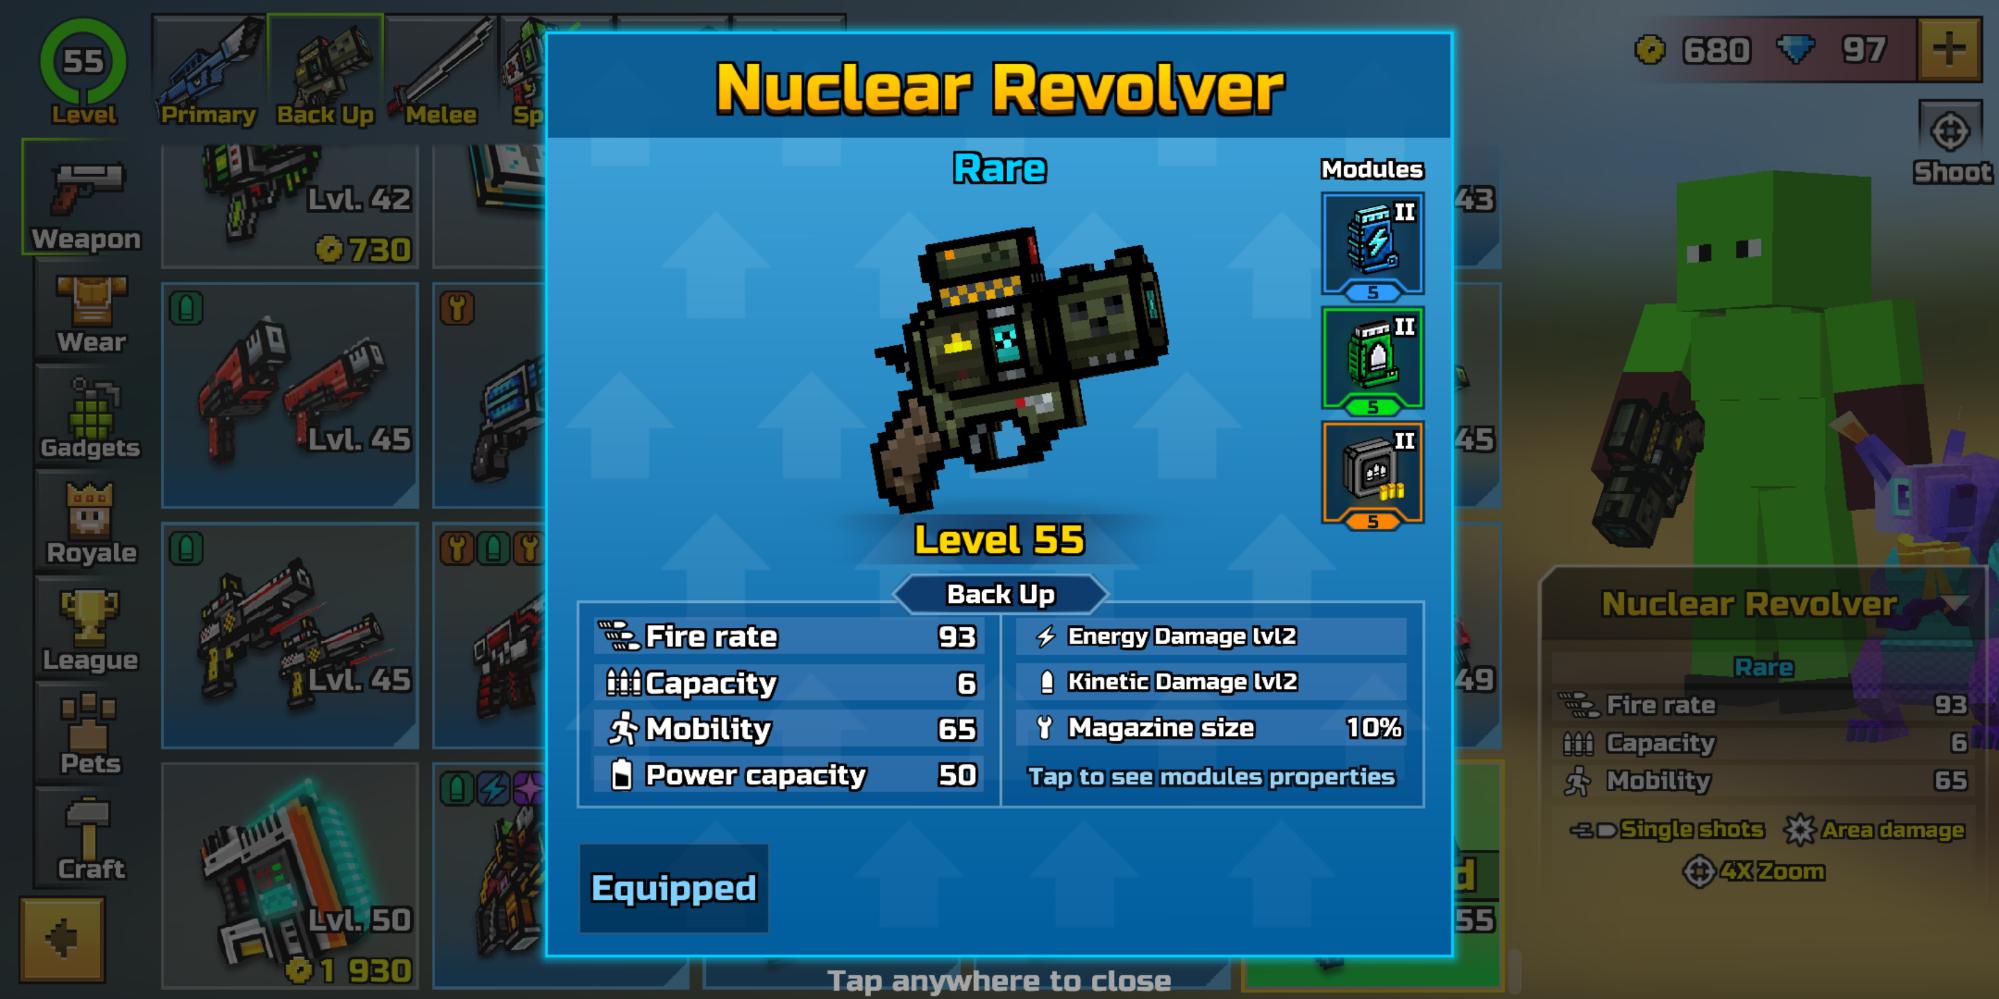 Insane Backup weapon LOL